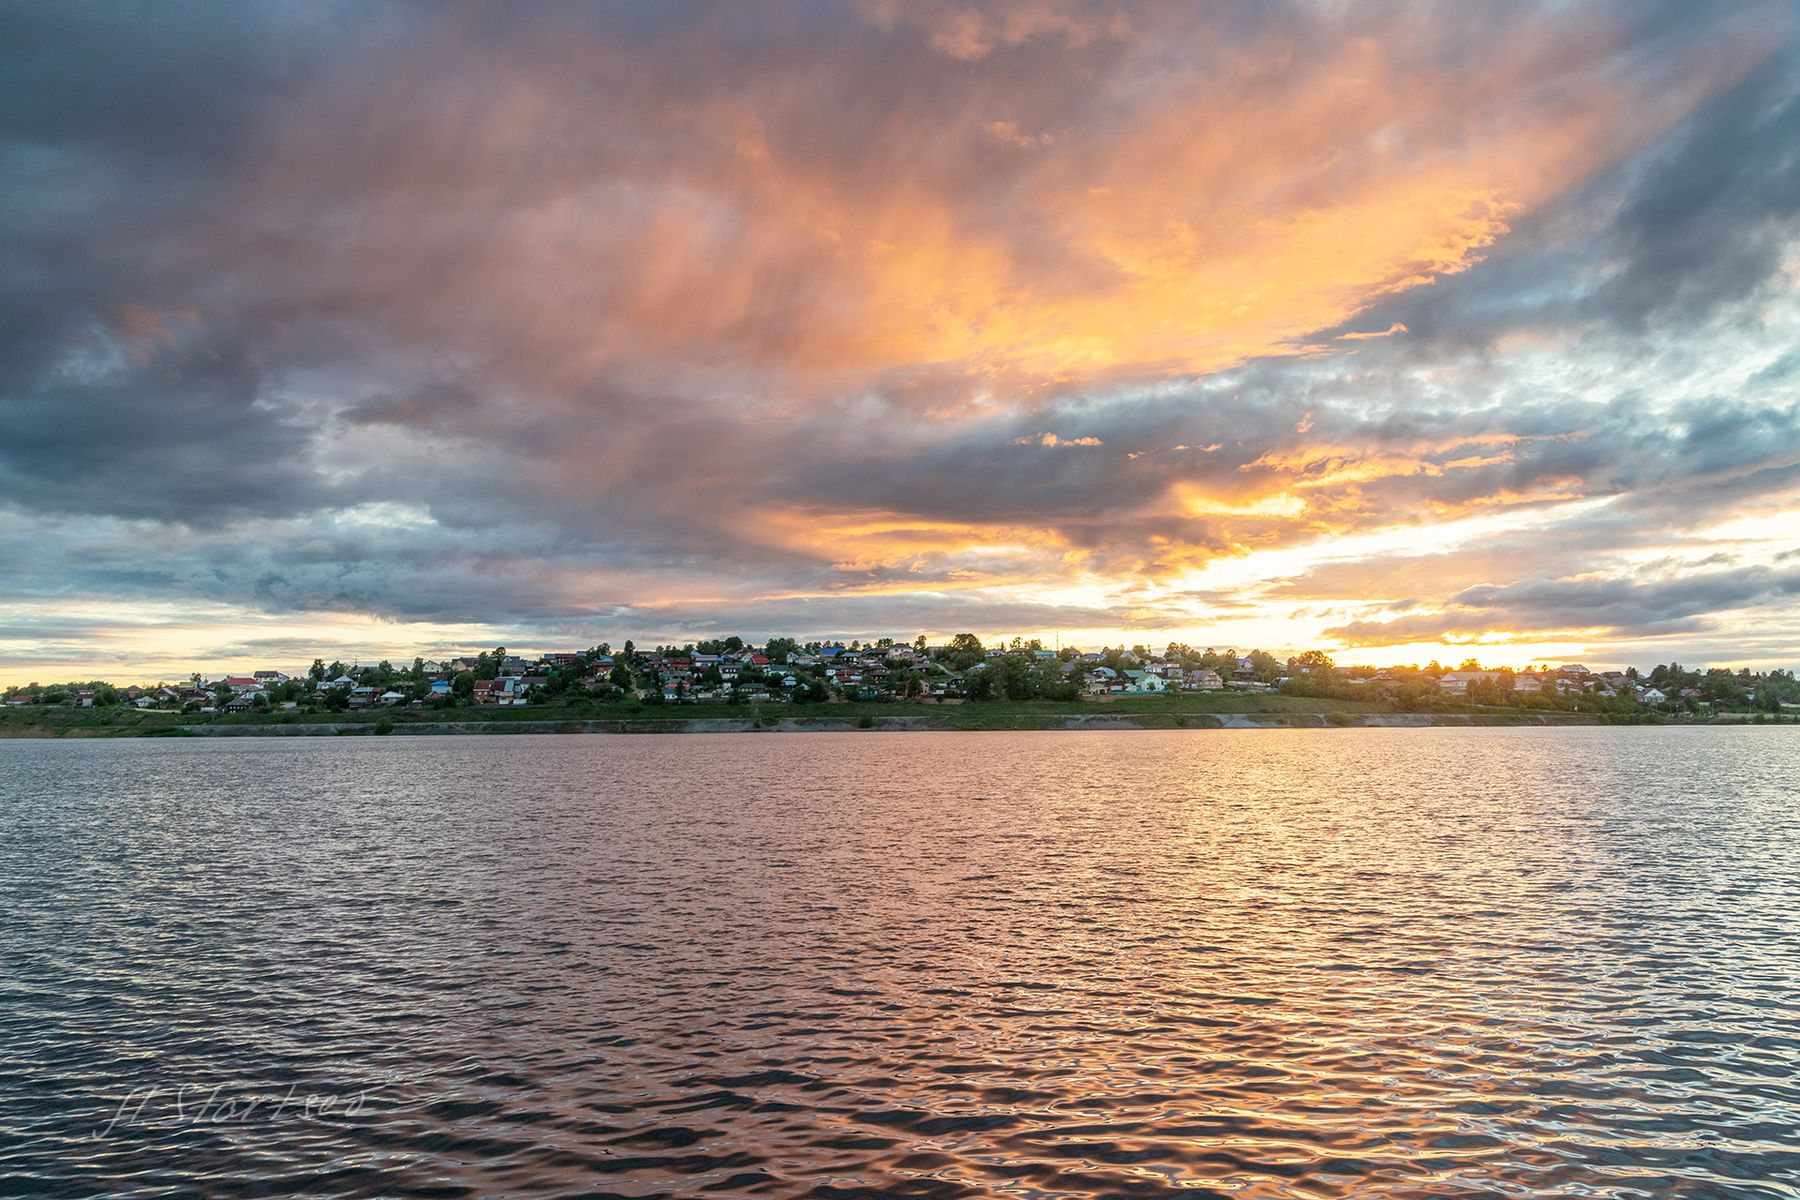 Закат на пруду пруд вода отражение вечер закат пейзаж Пермский_край Лысьва небо